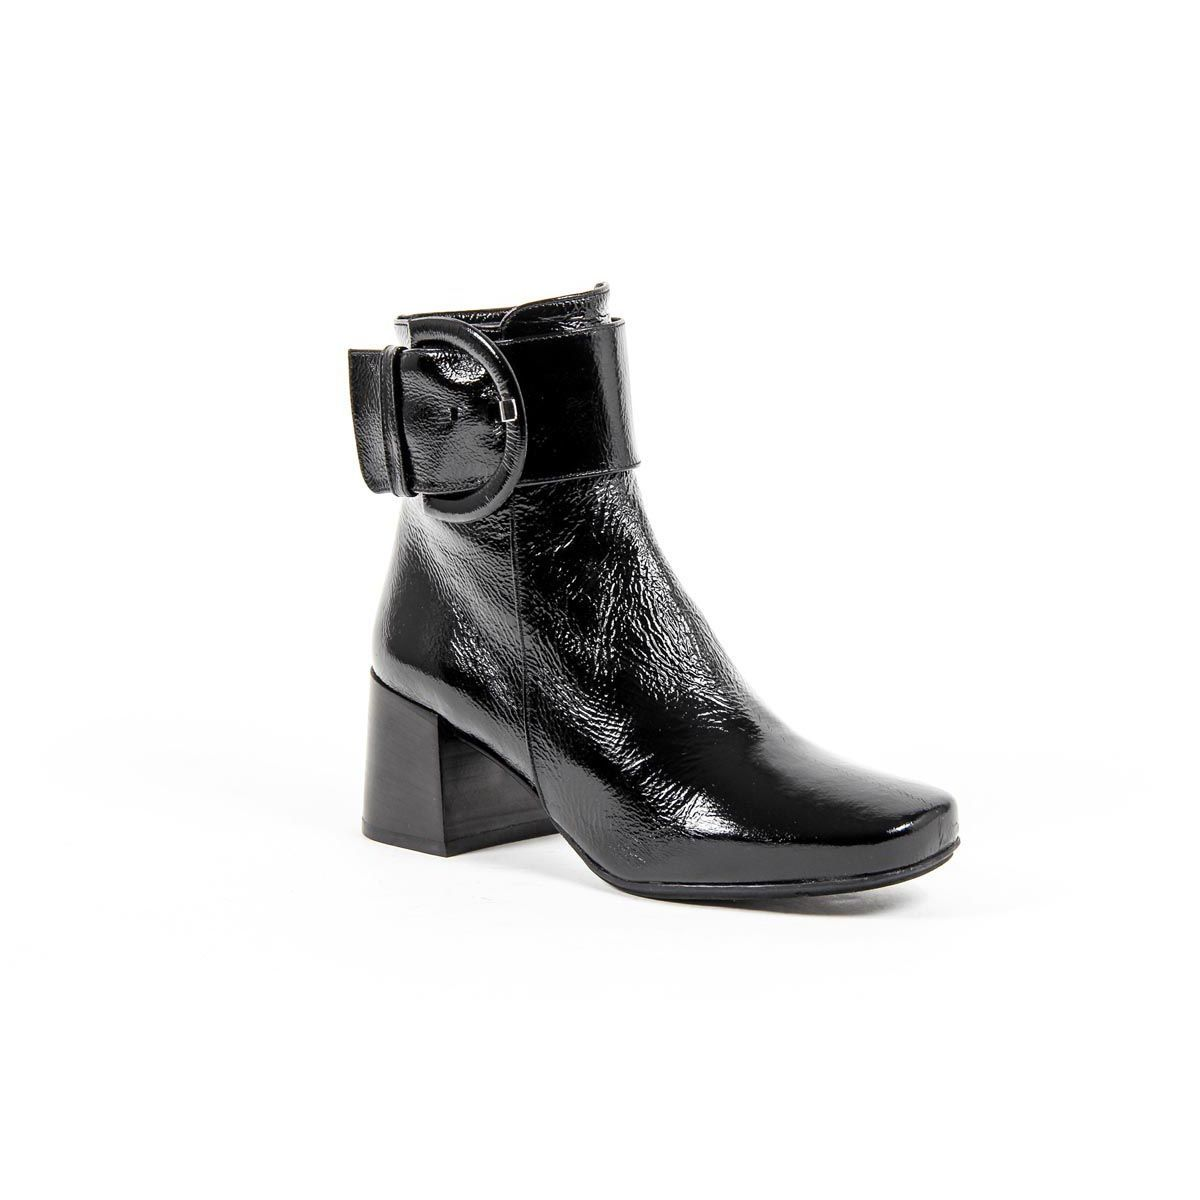 Versace 19.69 Abbigliamento Sportivo Srl Milano Italia Womens Heeled Ankle Boot B2484 FINISH NERO